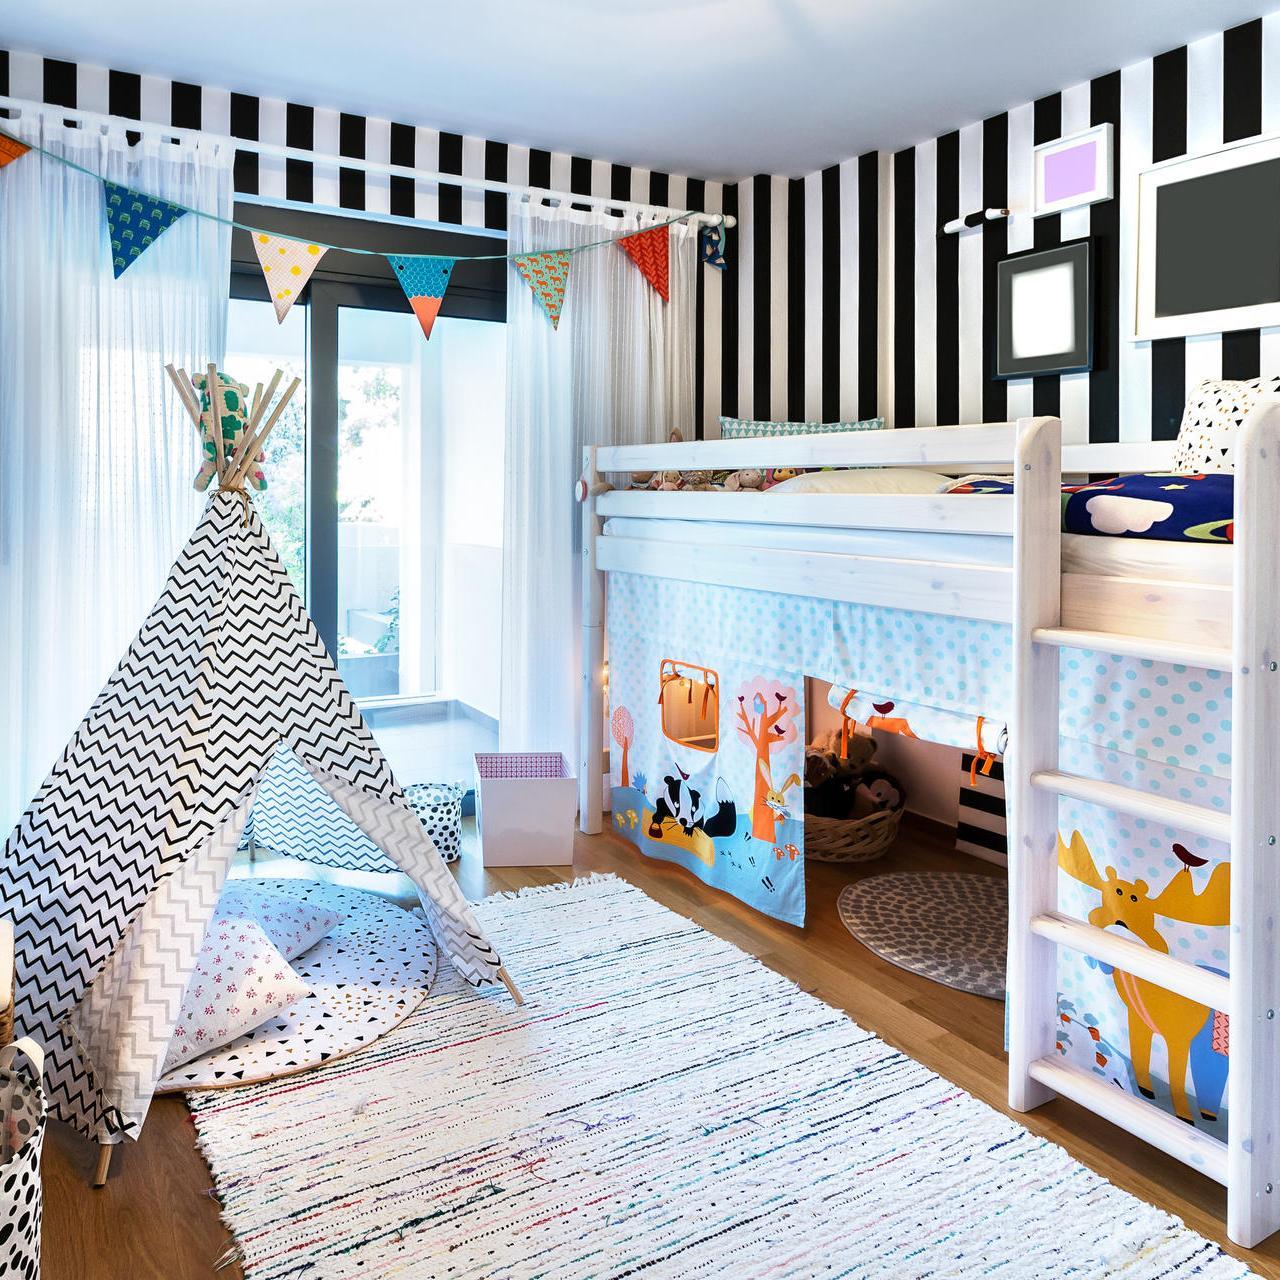 Full Size of Coole Kinderbetten Originelle Fr Jungen Und Mdchen T Shirt Sprüche T Shirt Betten Wohnzimmer Coole Kinderbetten